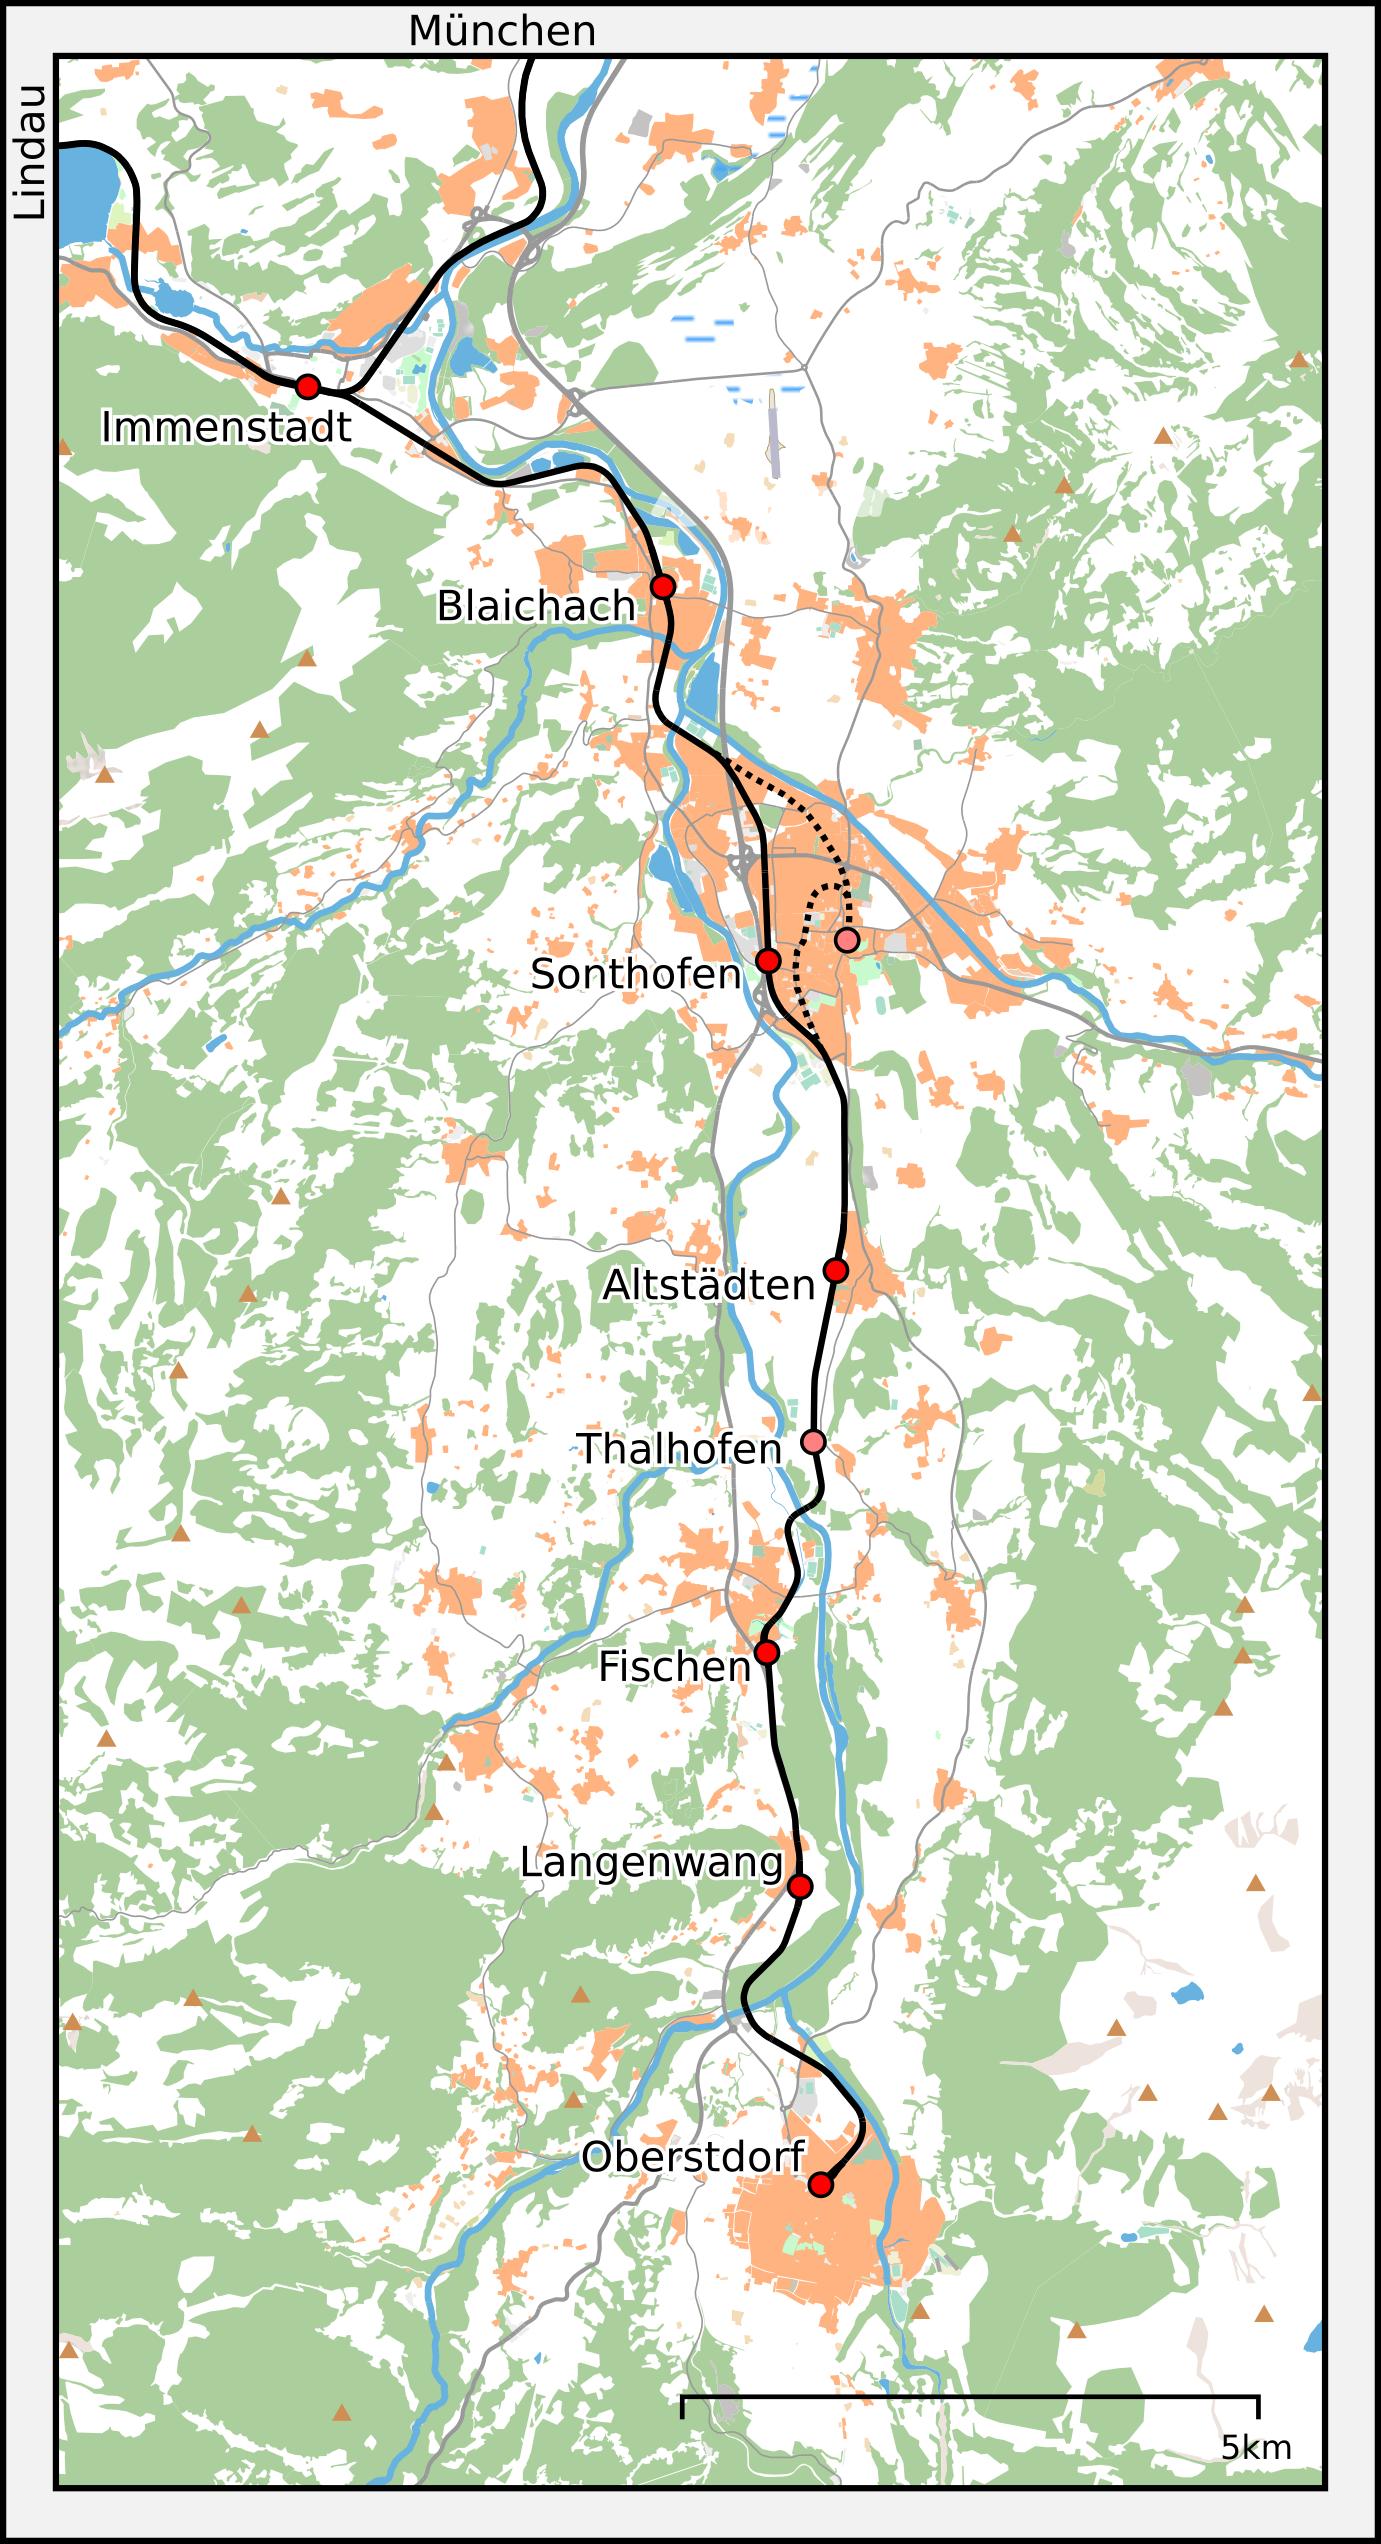 Bahnstrecke Immenstadtoberstdorf Wikipedia